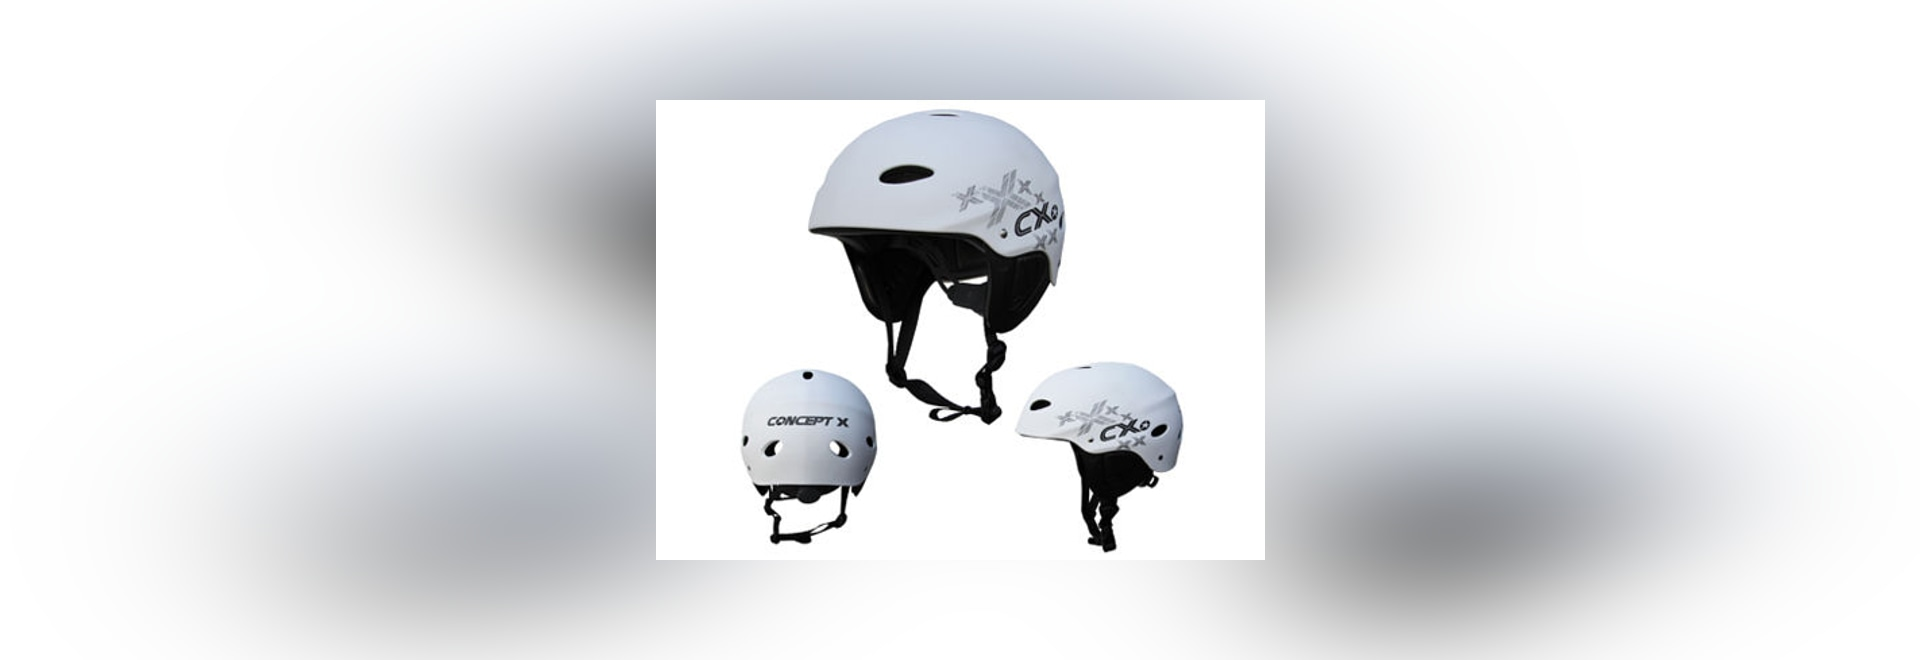 New Kite/Surf helmet by EM SPORTS